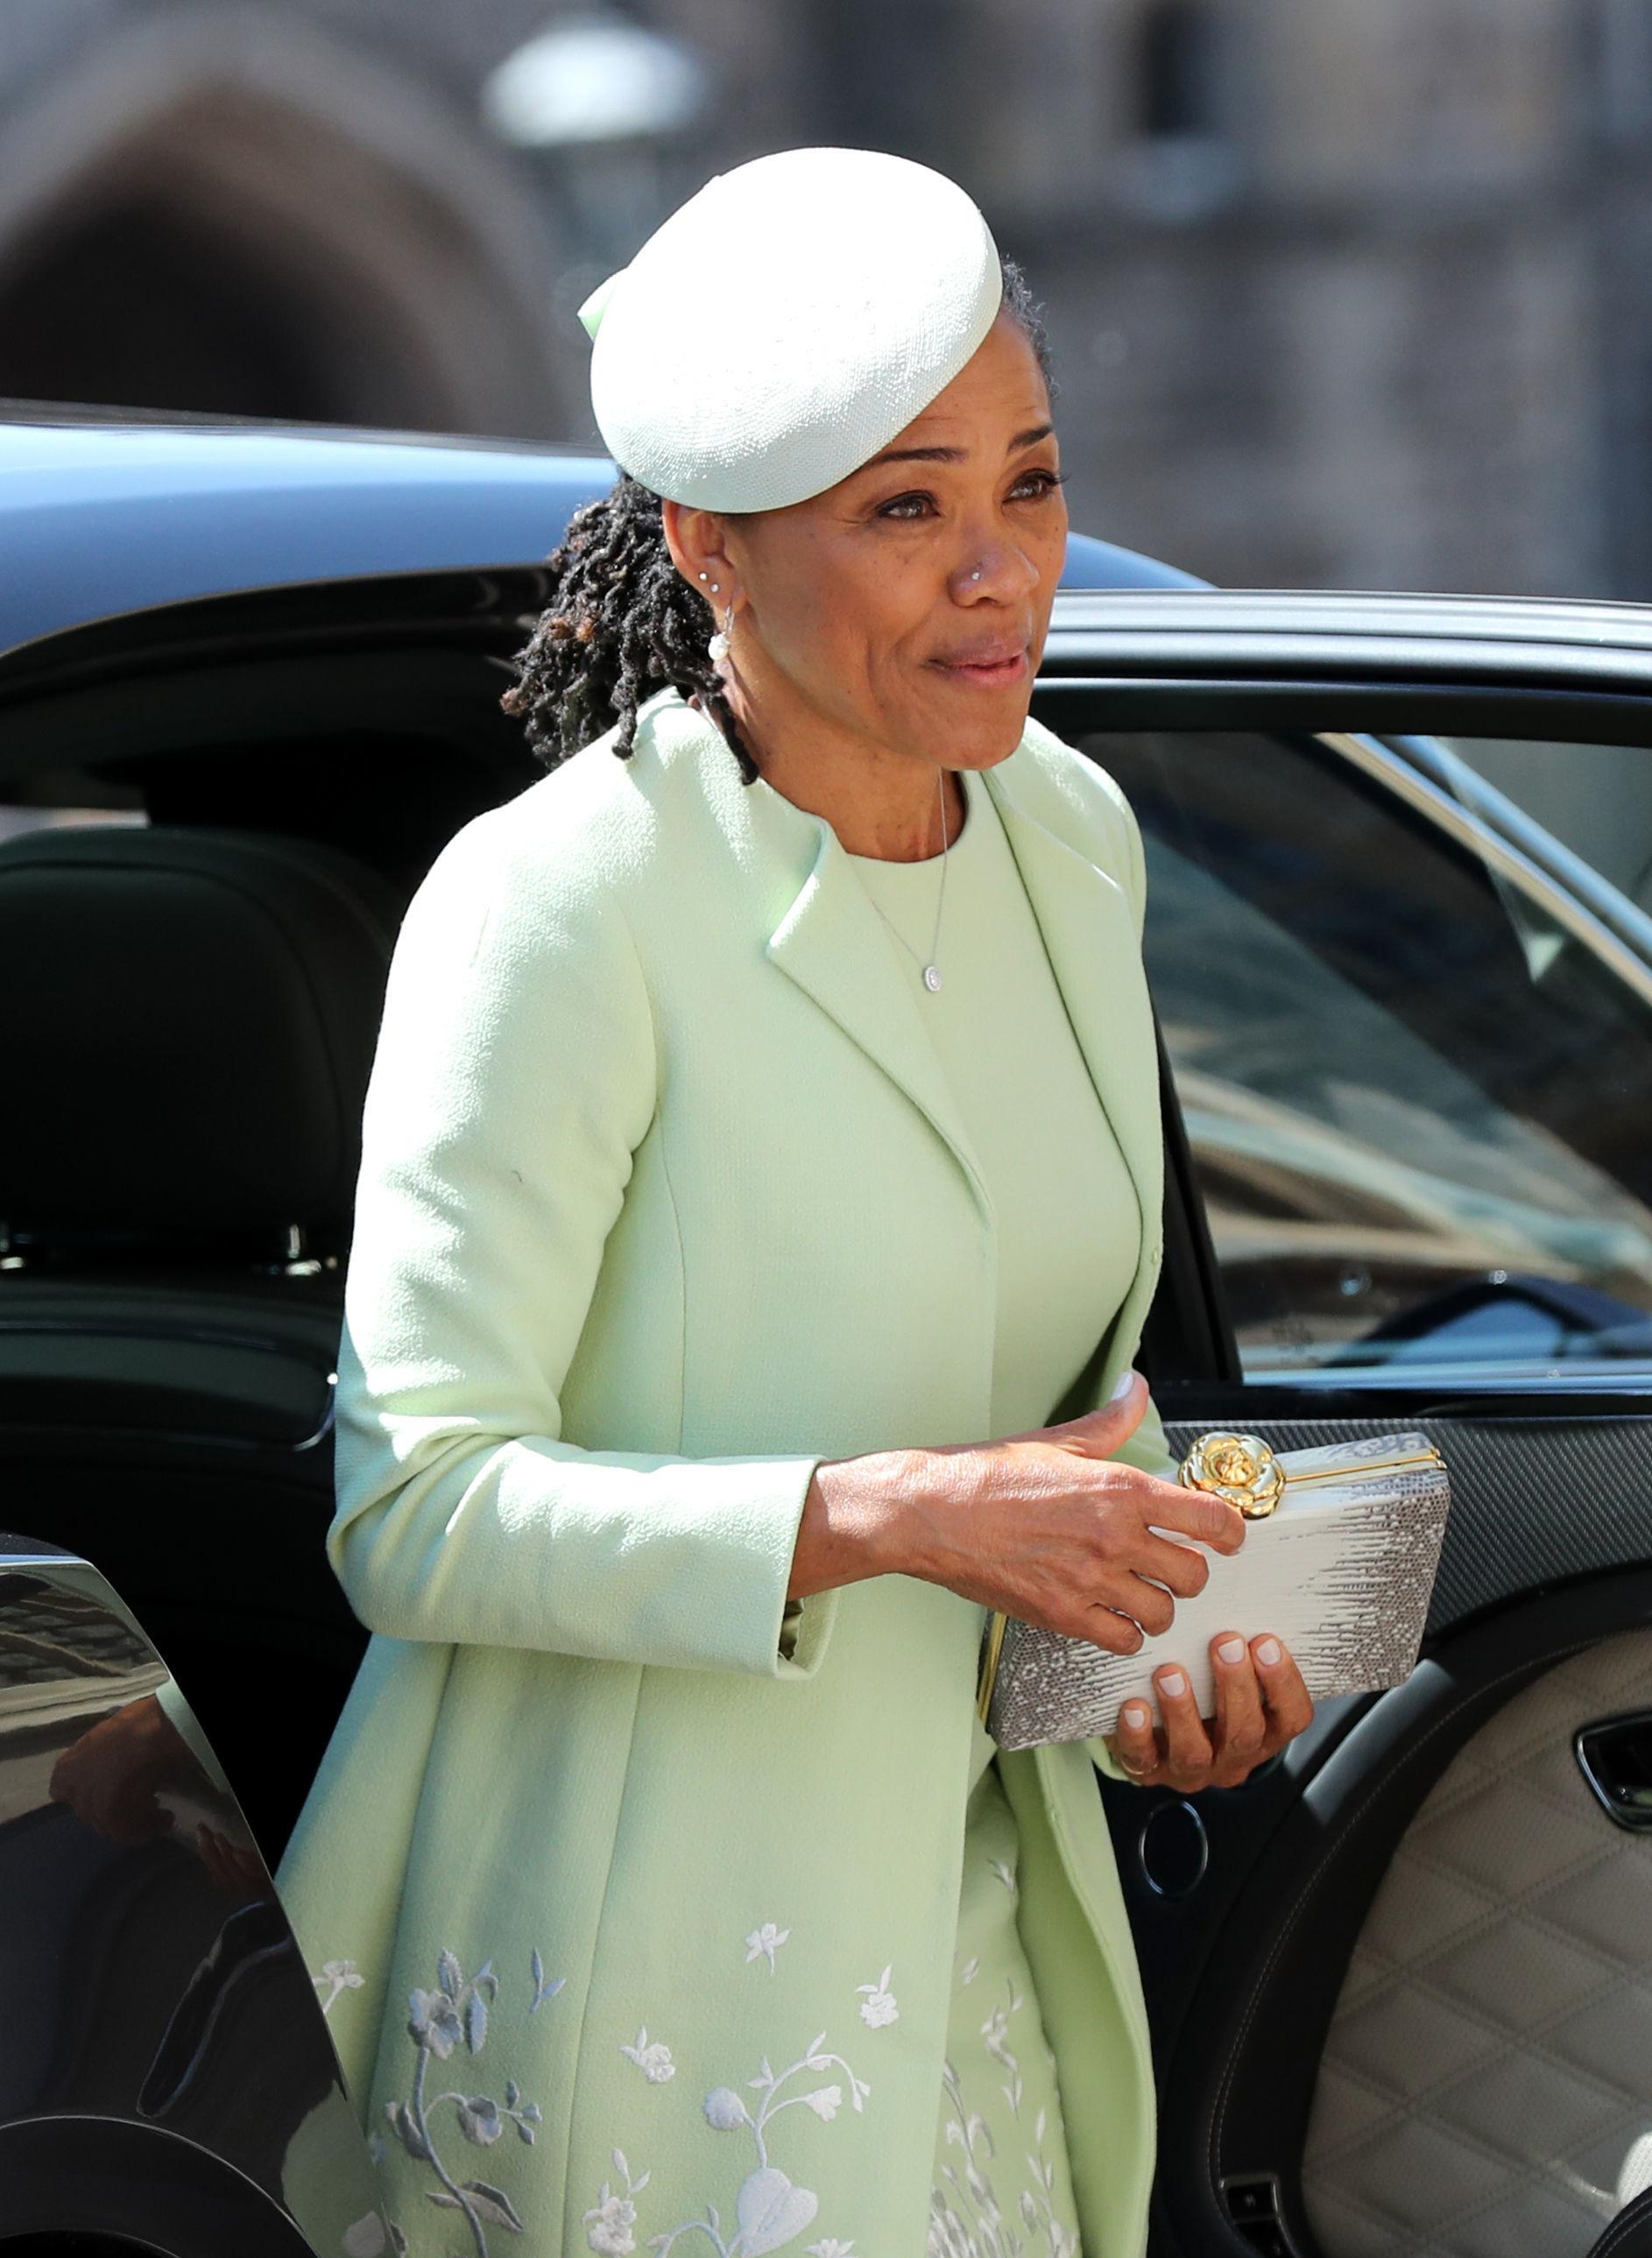 Doria Ragland royal wedding 2018